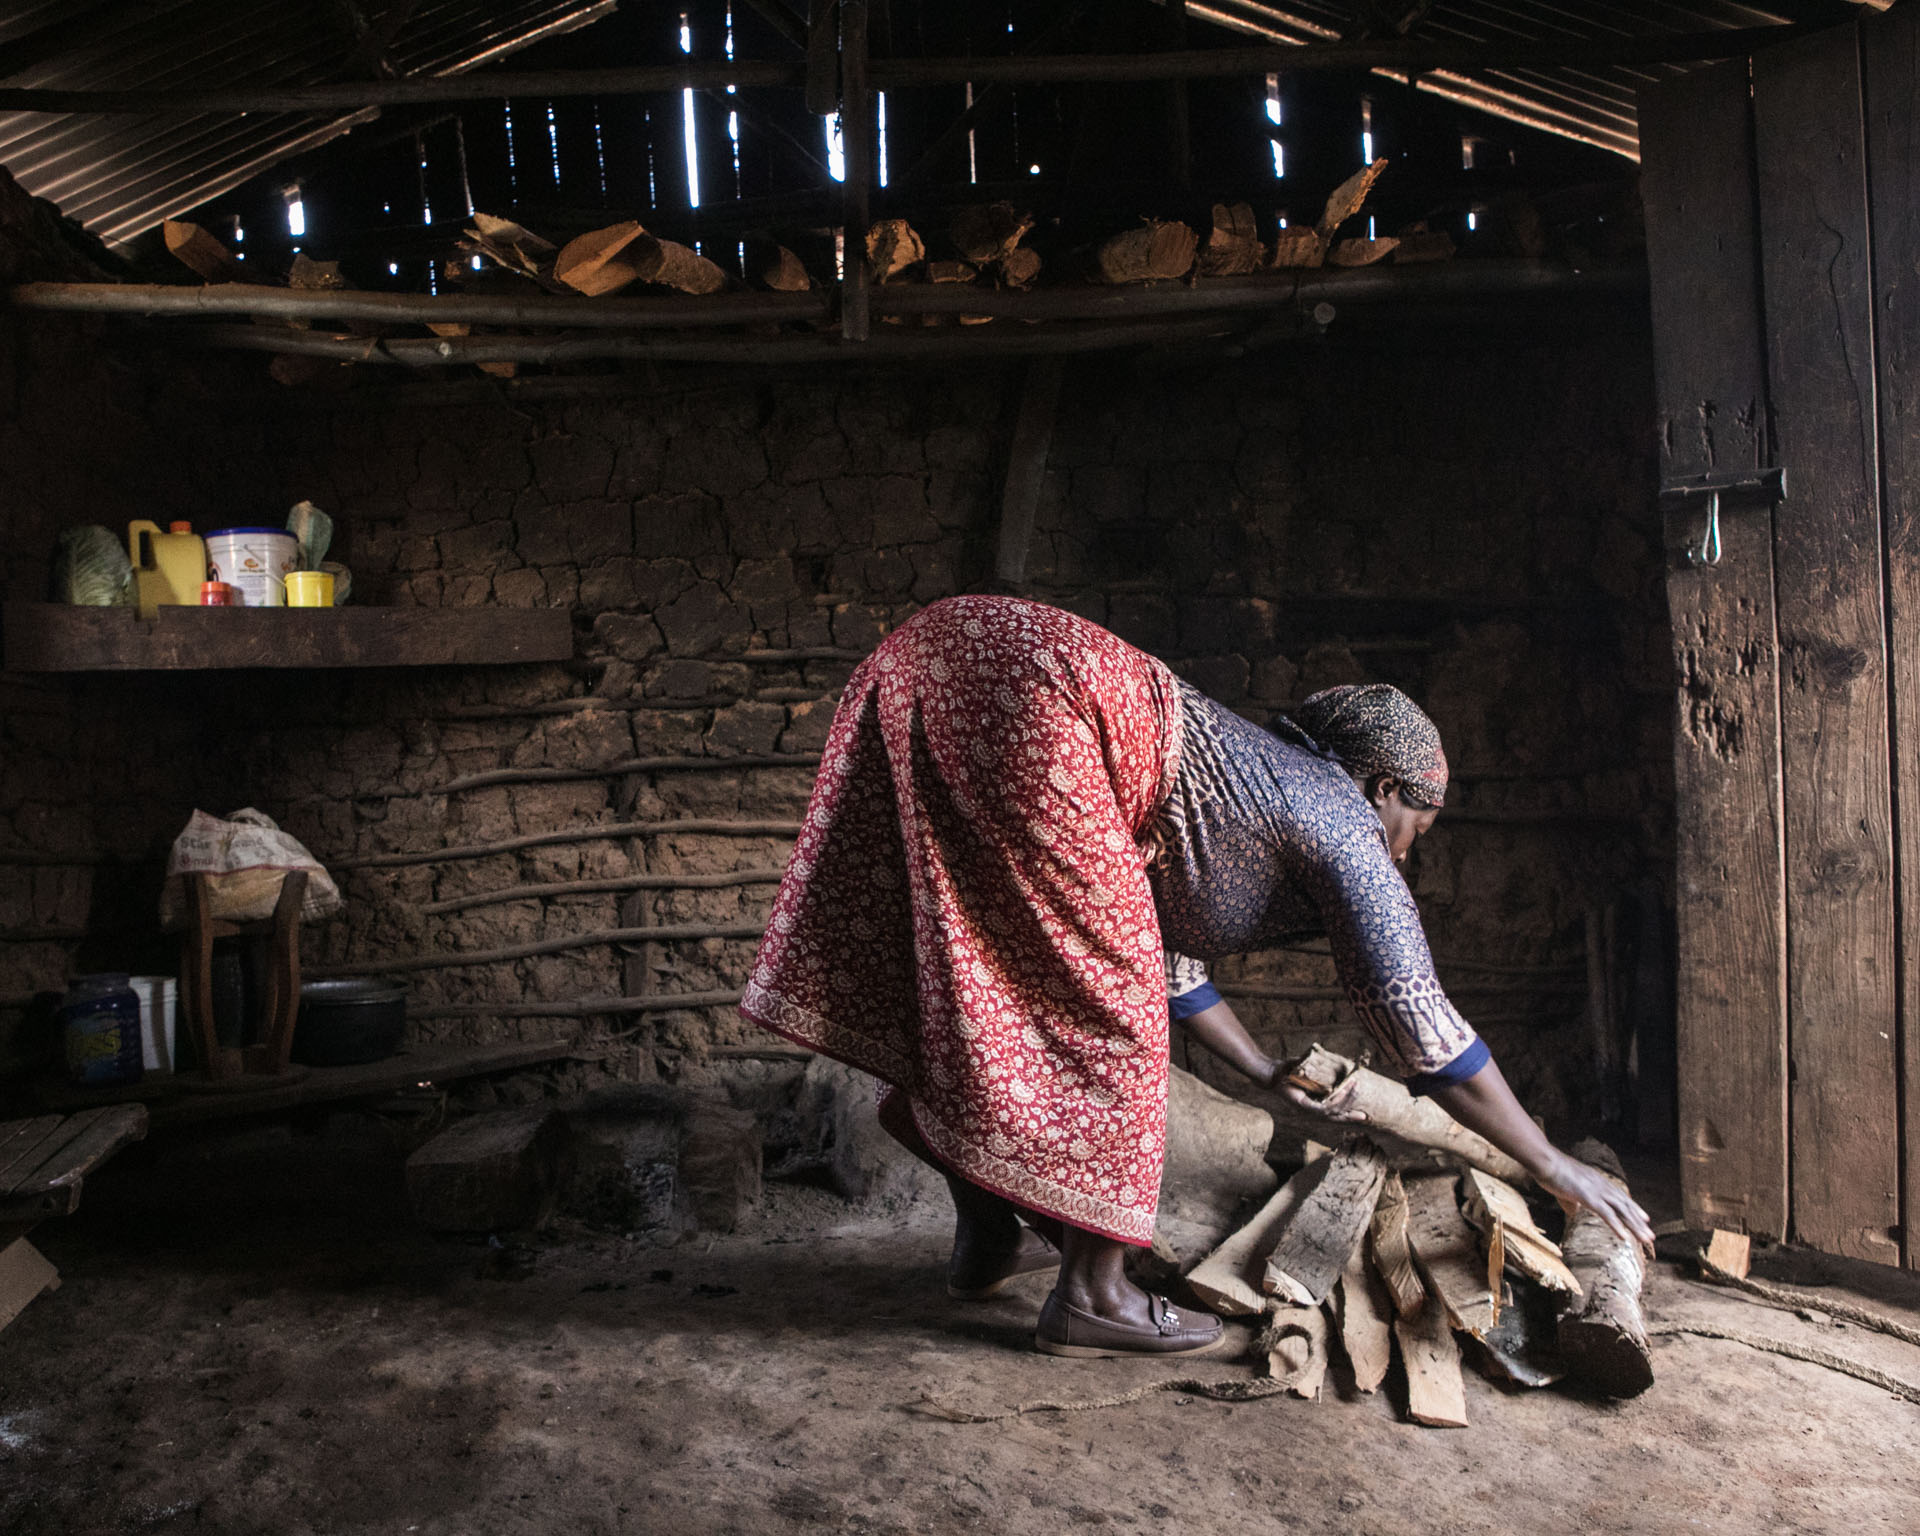 stufa salomè forno migliorato matteo de mayda kenya mani tese 2018